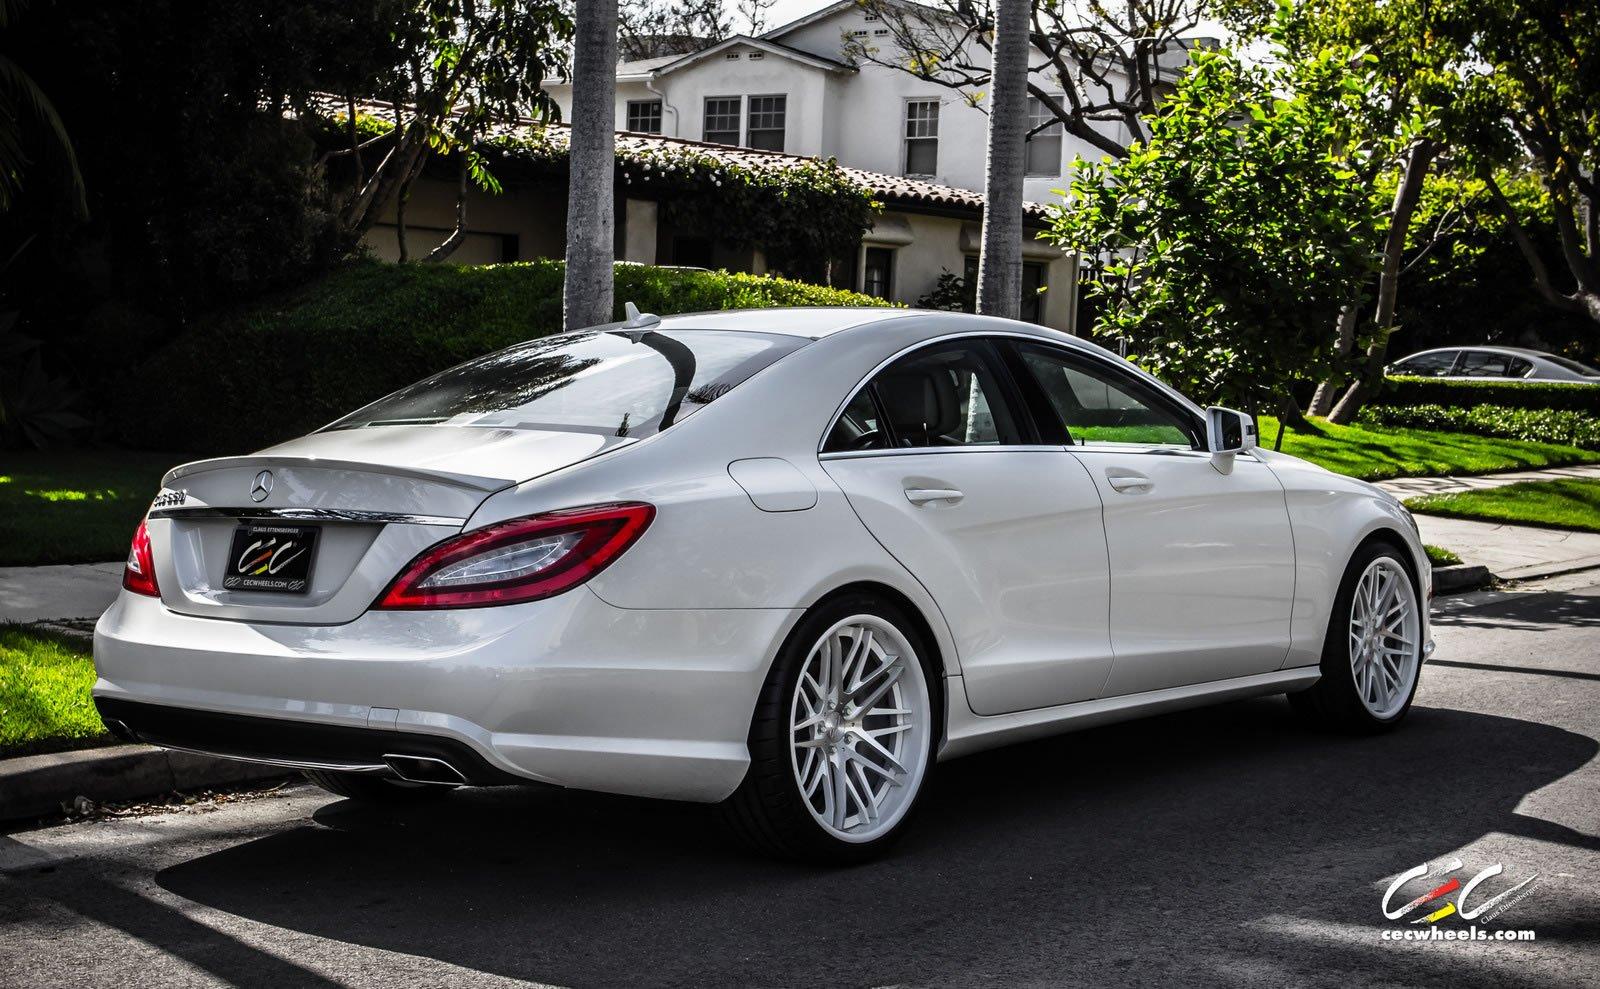 2015 cec wheels tuning cars mercedes benz carlsson cls 550 for 2015 mercedes benz cls550